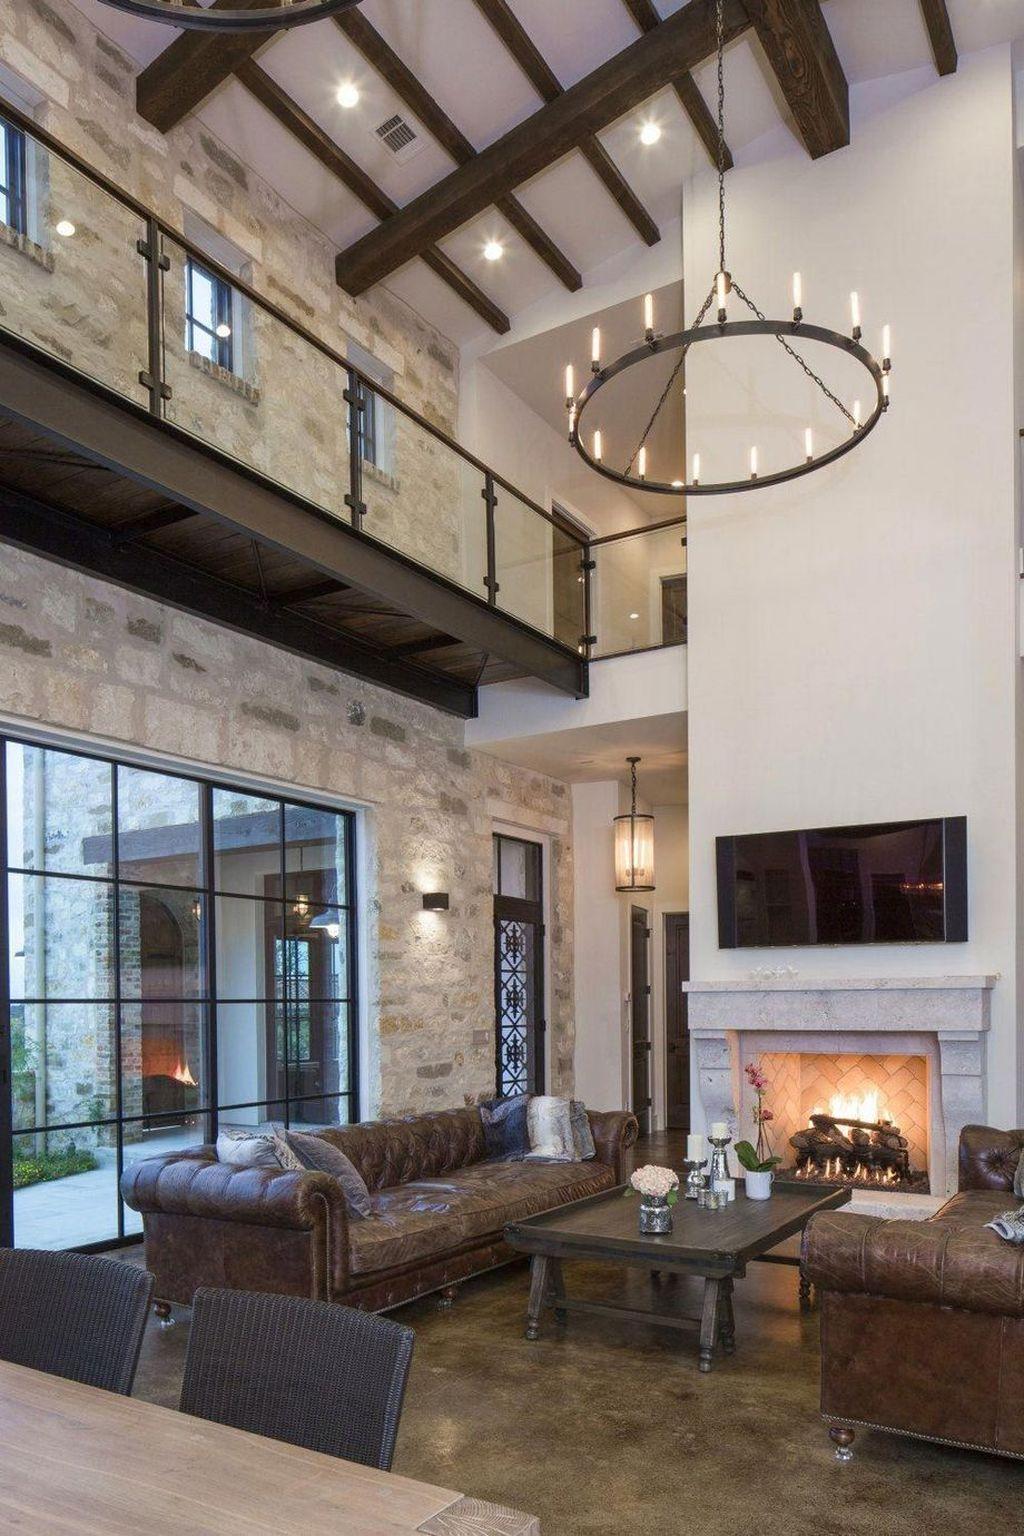 Stunning Italian Rustic Decor Ideas For Your Living Room 04